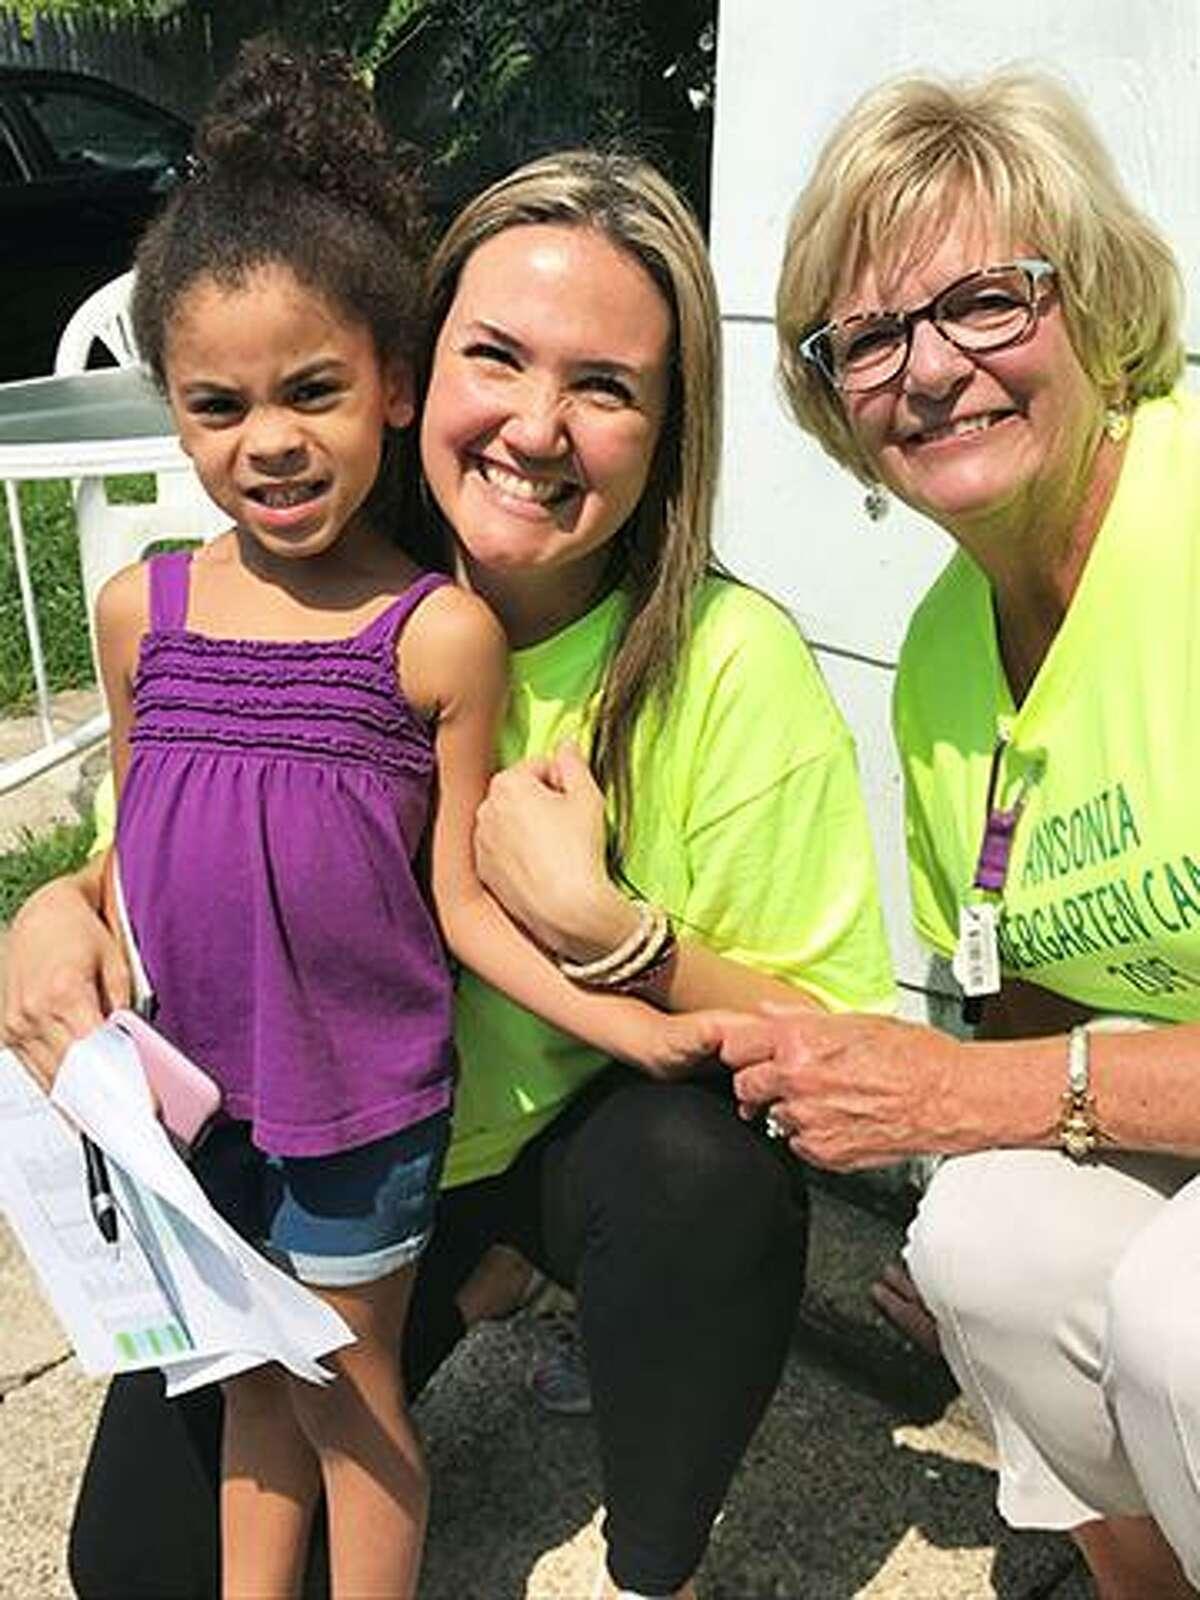 Mead School Principal Amy Cosciello, center, and teacher Patti Biga meet an incoming kindergarten student.